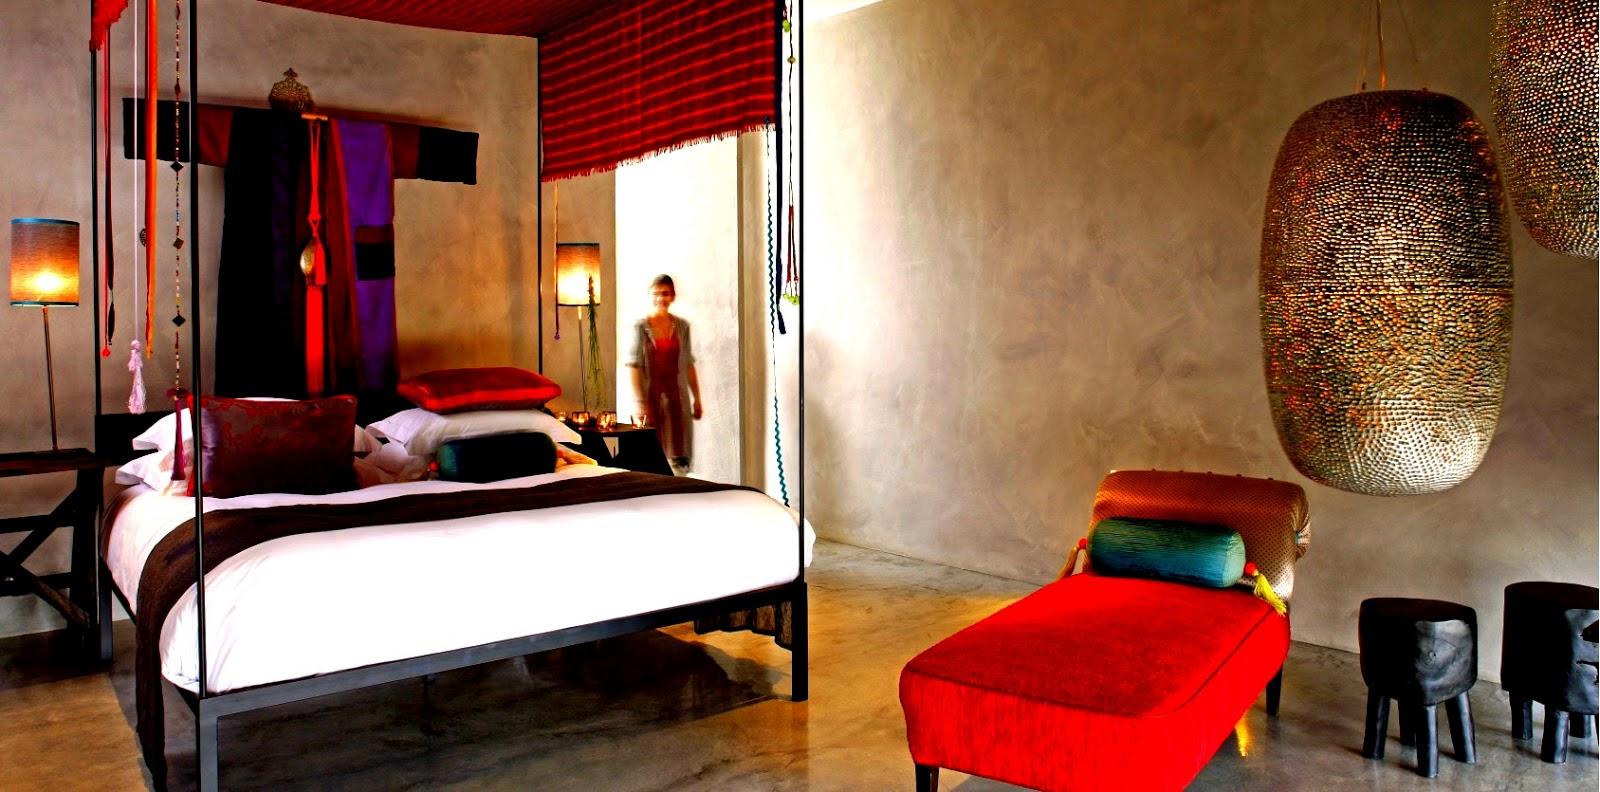 loveisspeed areias do seixo charm hotel lisbon. Black Bedroom Furniture Sets. Home Design Ideas